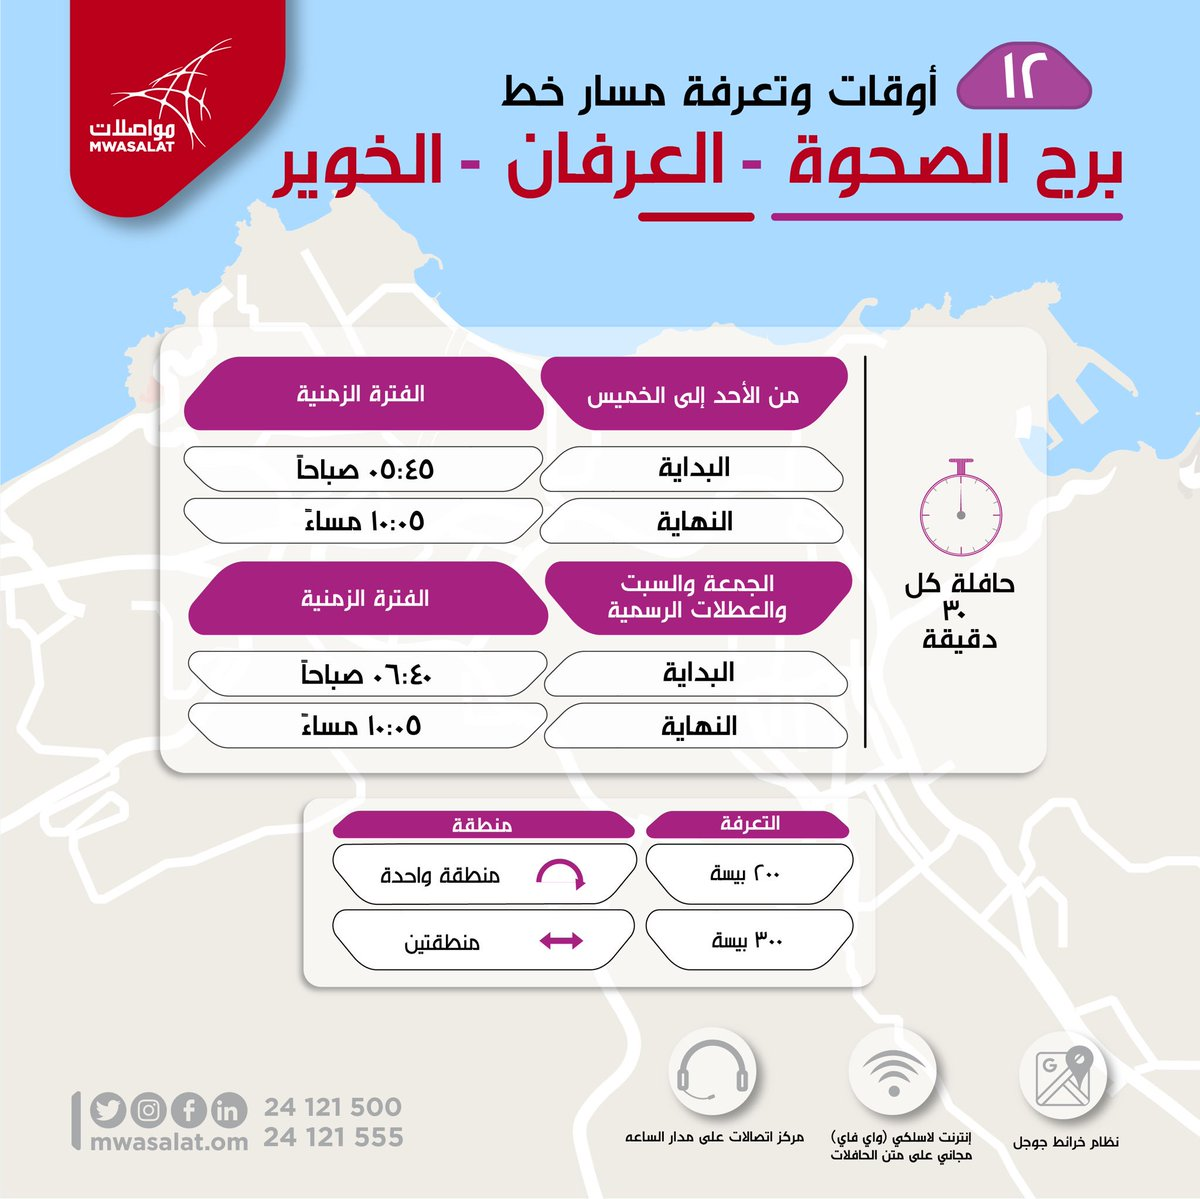 مواصلات Mwasalat ع مان On Twitter Starting From Today Mwasalat Arrived To Madinat Alrfan Ghala Passing By Ocec Military Technological College Oman Tourism College Ministry Of Higher Education